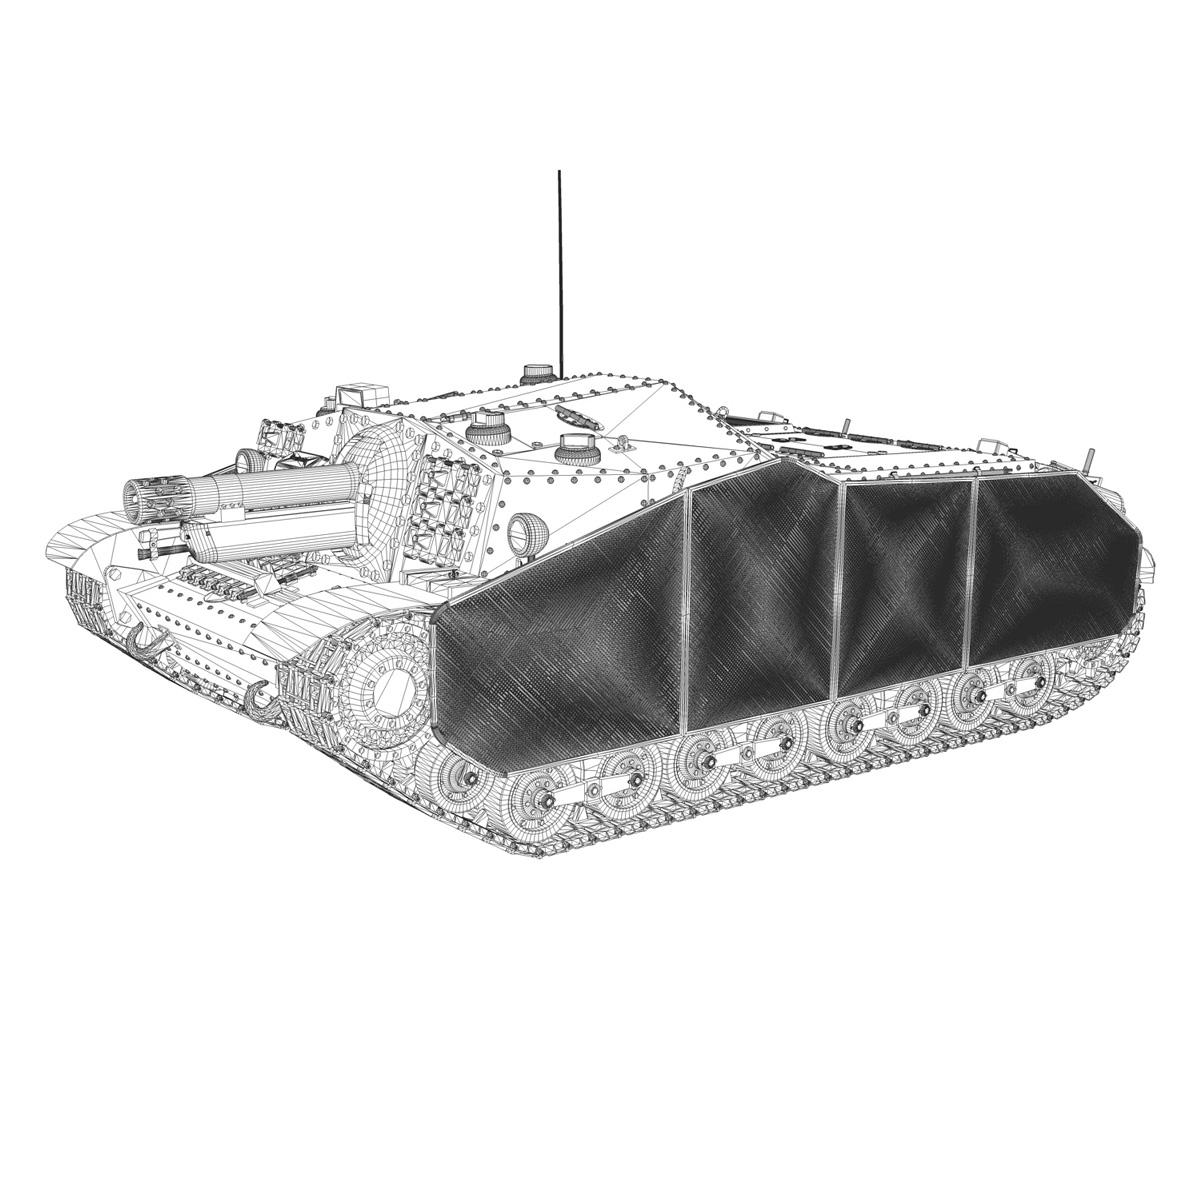 43m zrinyi ii - Macar hücum silahı 3d model 3ds fbx c4d lwo obj 251639